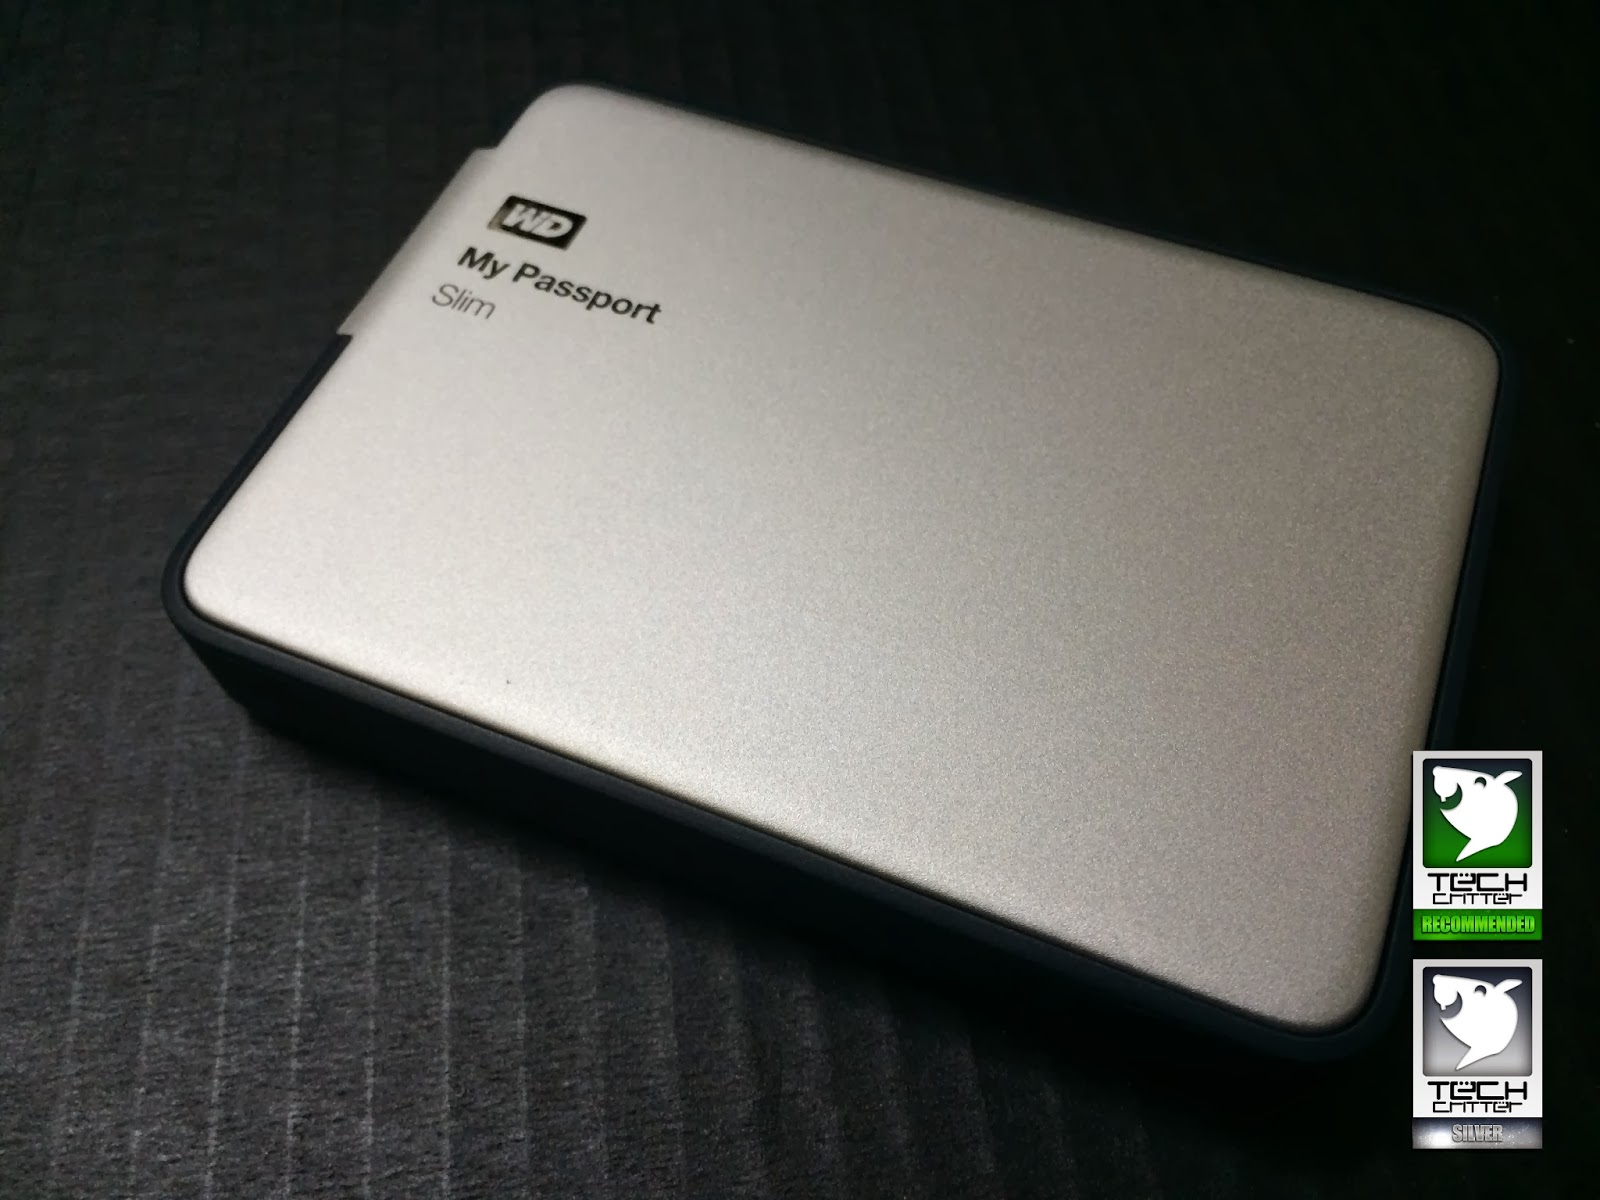 Unboxing & Review: Western Digital My Passport Slim 108